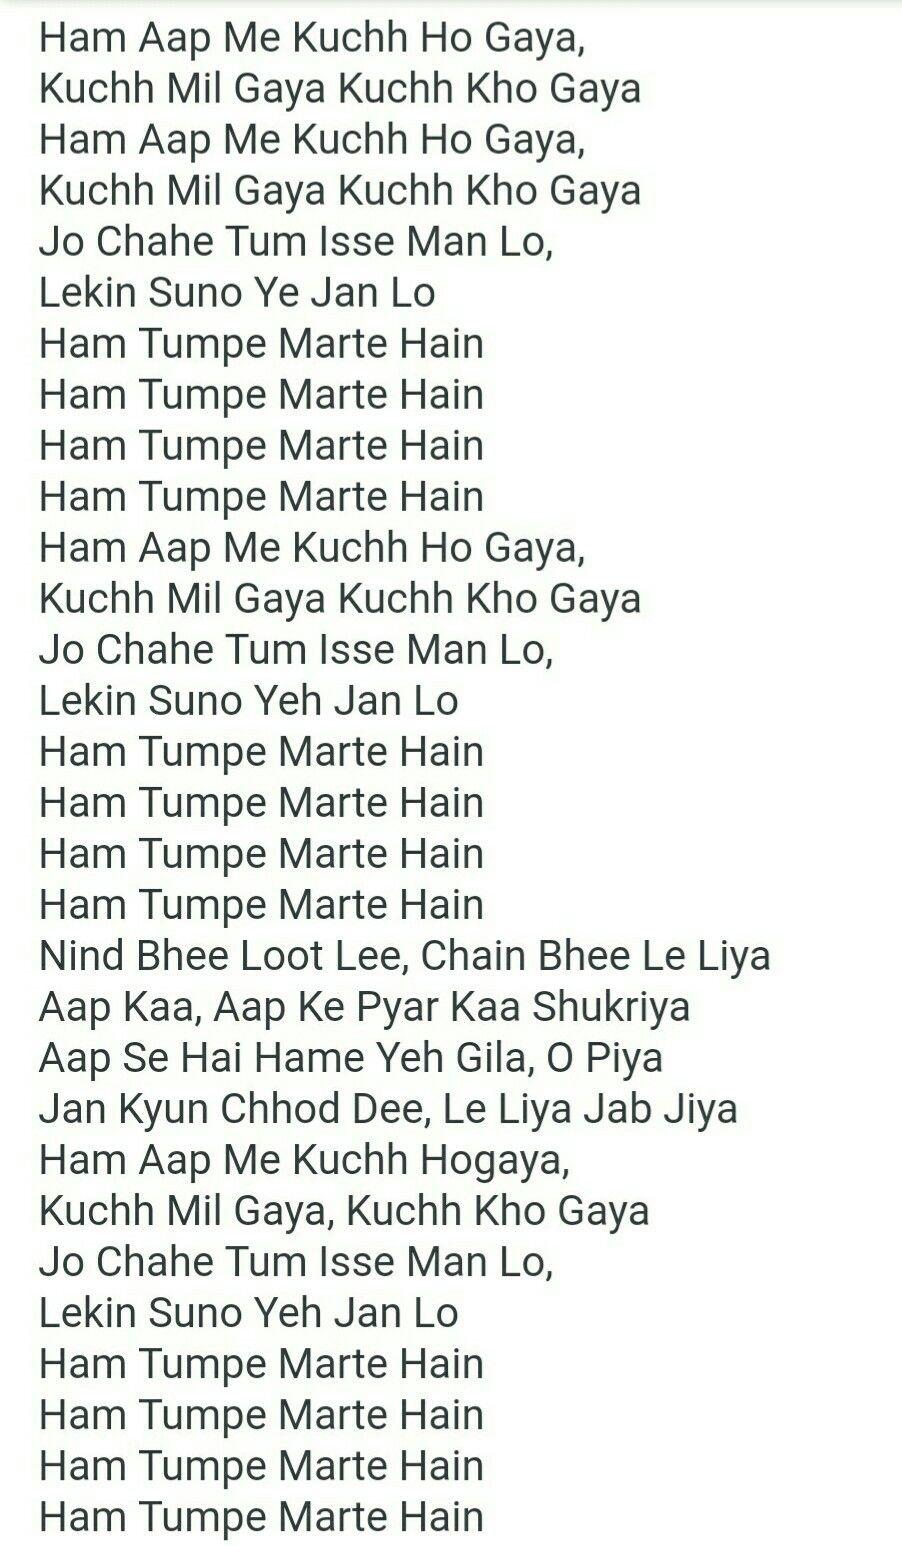 Pin By Akshay Budhkar On Songs Lyrics Hindi English Etc Song Lyrics Songs Lyrics Browse popular bollywood and famous hindi lyrics of indian movie songs. pin by akshay budhkar on songs lyrics